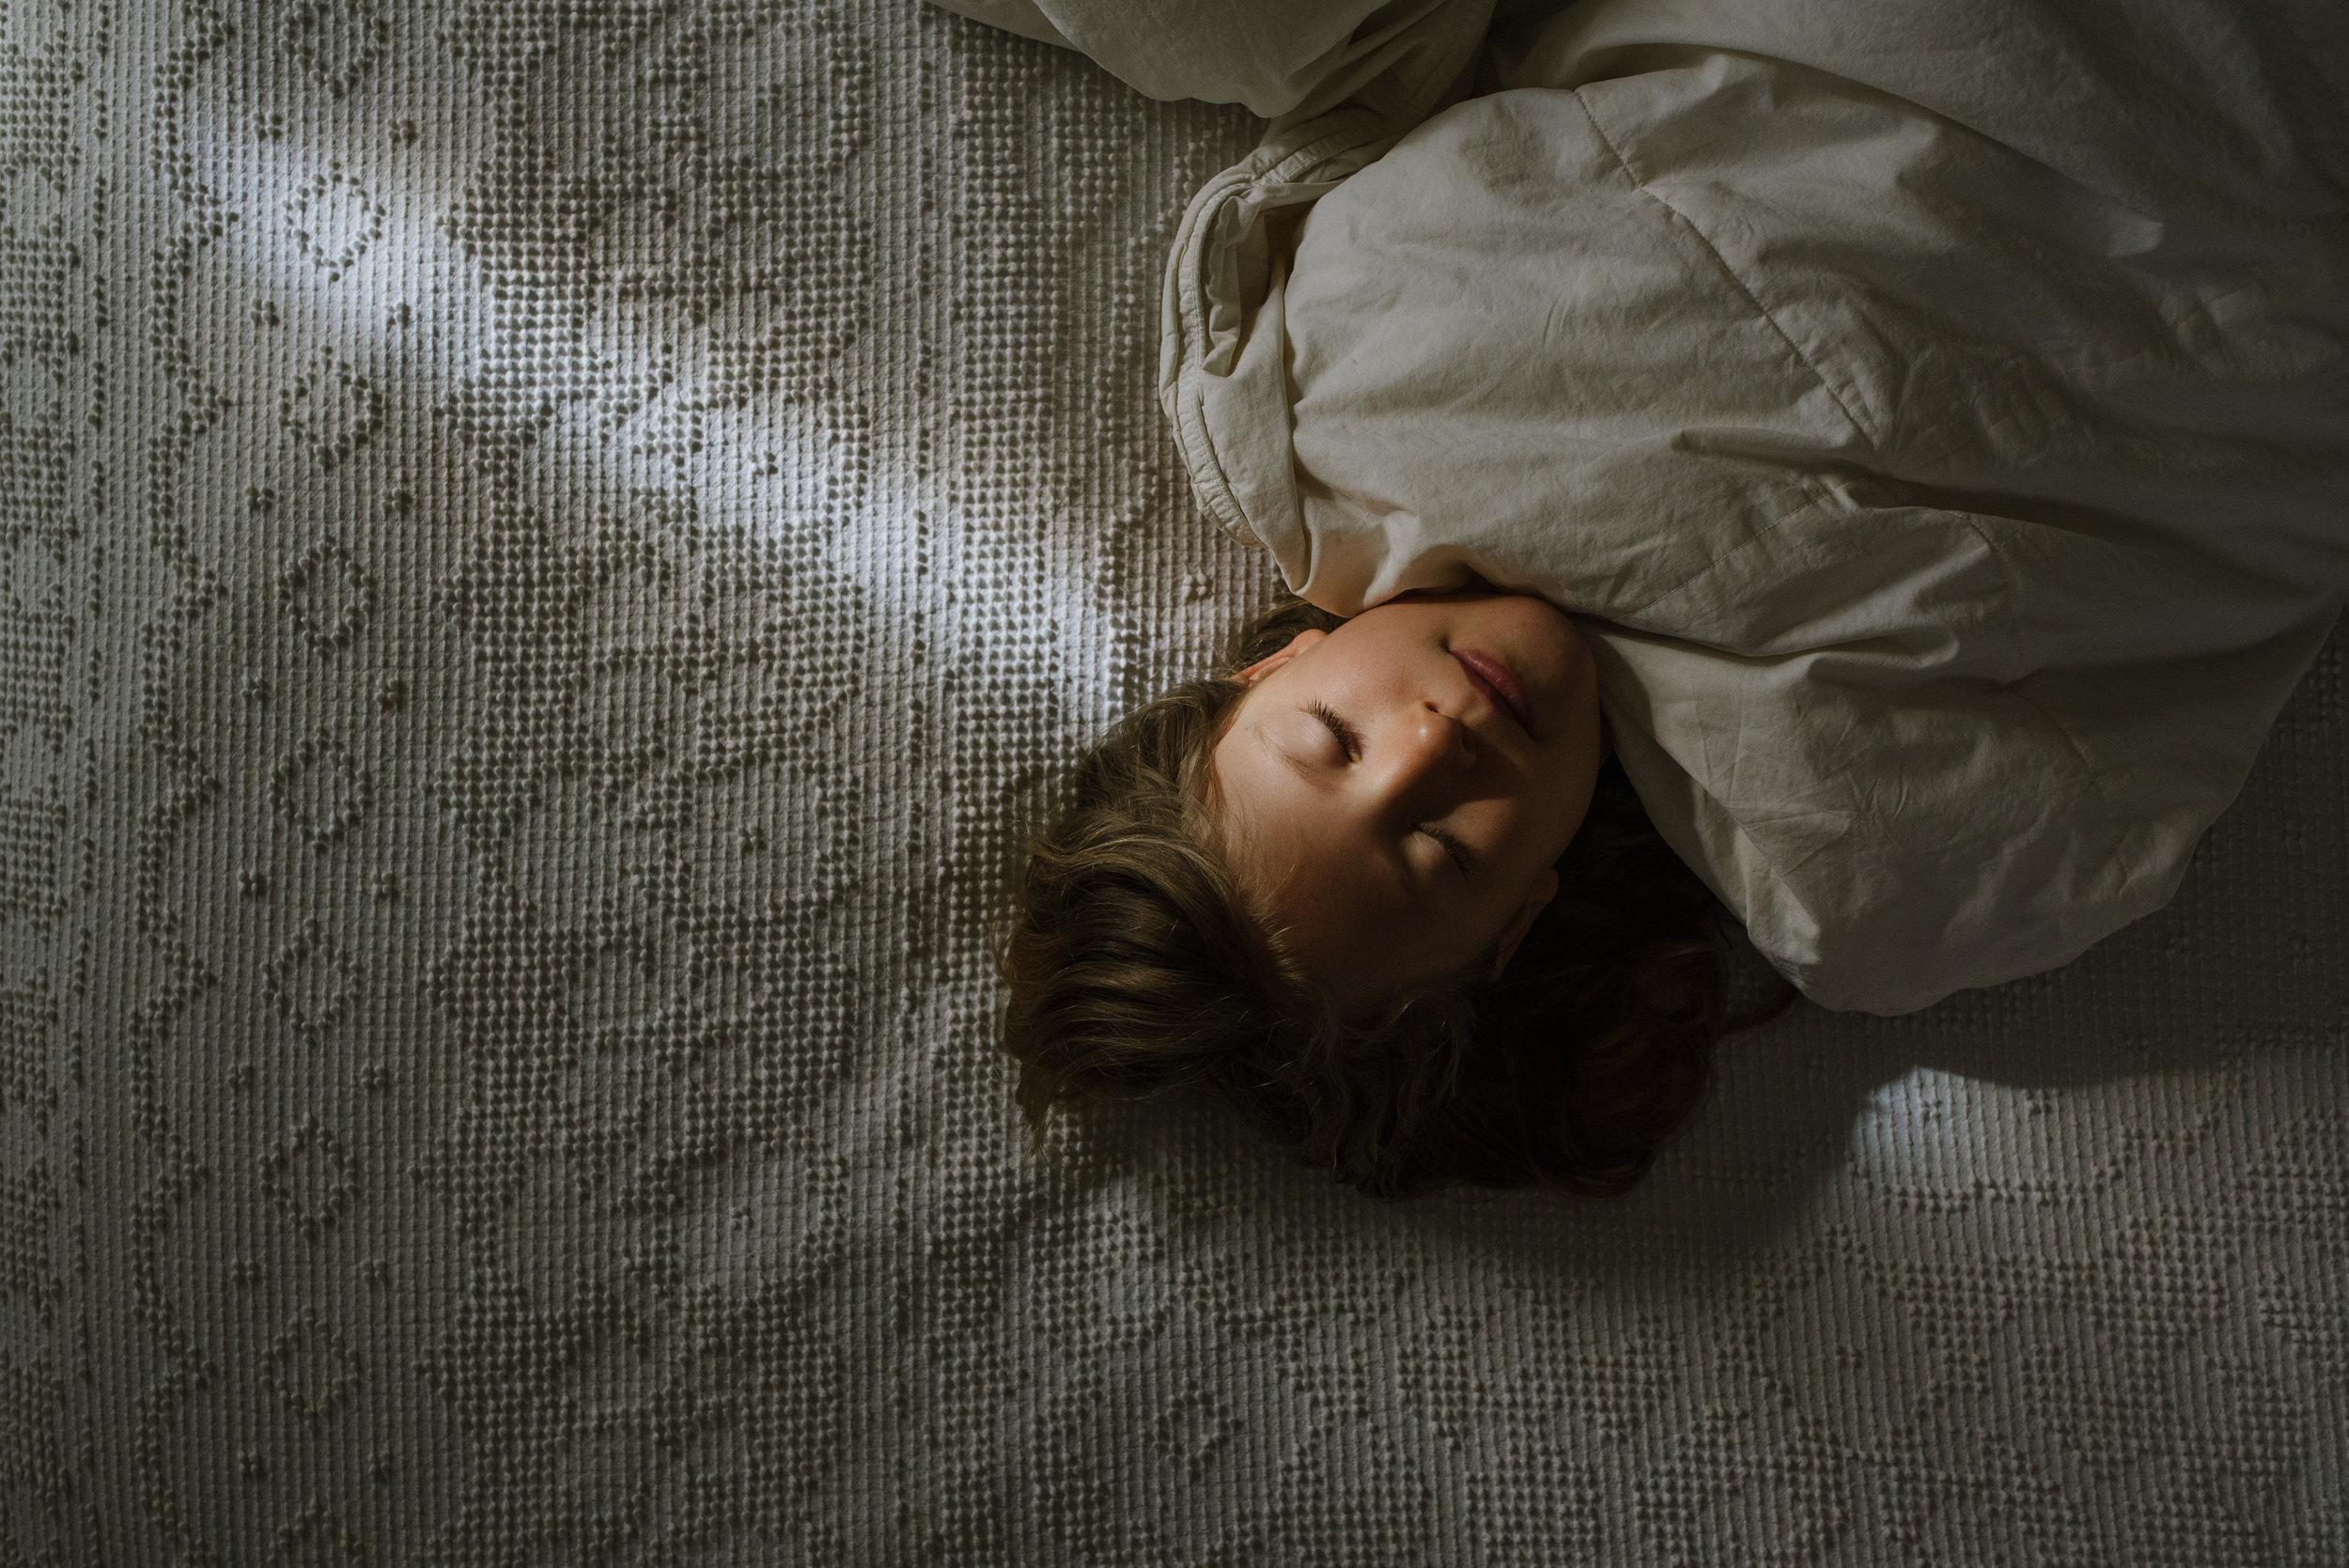 sleepinggirl (1 of 2).jpg